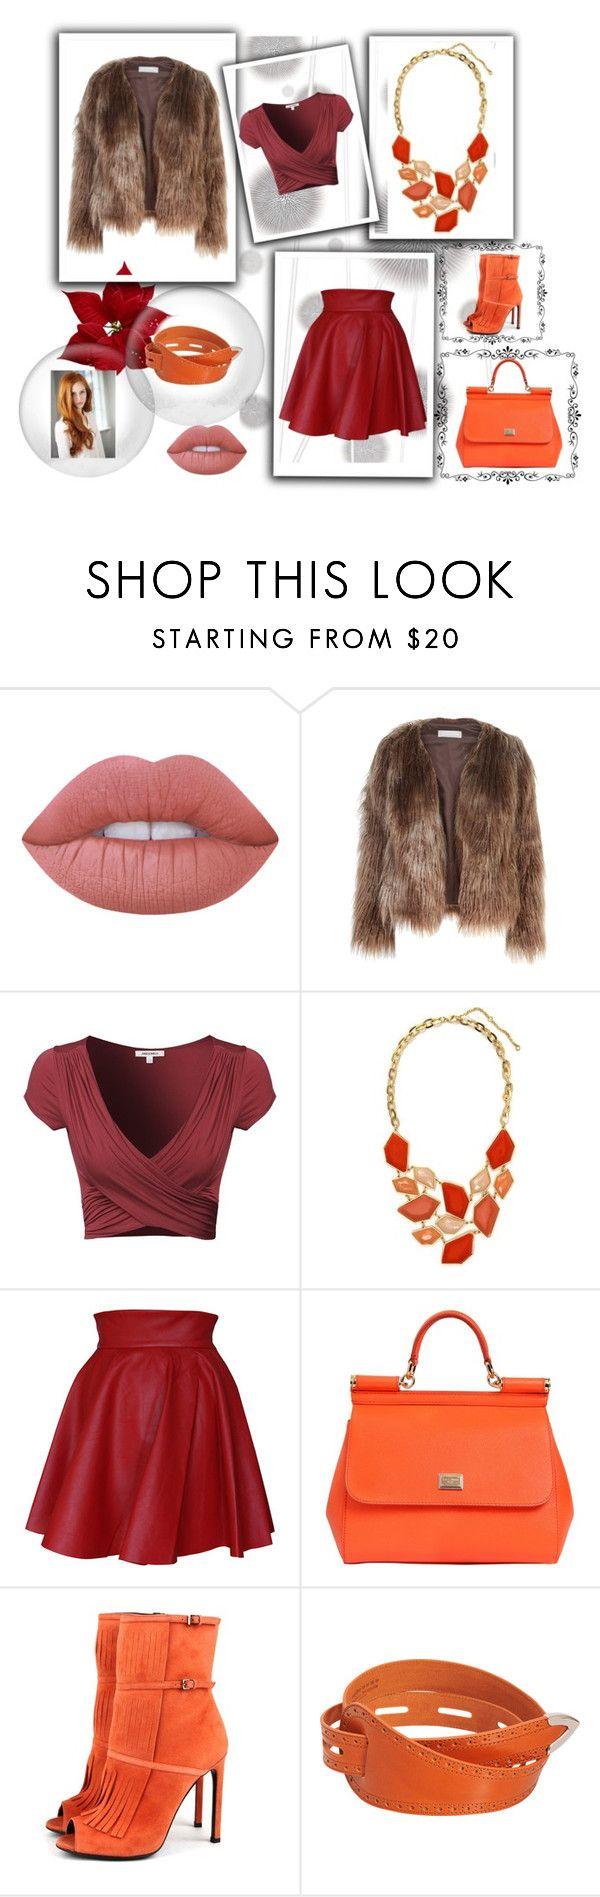 """confessions of a shopaholic"" by srishti-kar on Polyvore featuring Komar, Lime Crime, Related, Funlayo Deri, Dolce&Gabbana, Gucci, Maison Margiela, colours, pop and shopaholic"